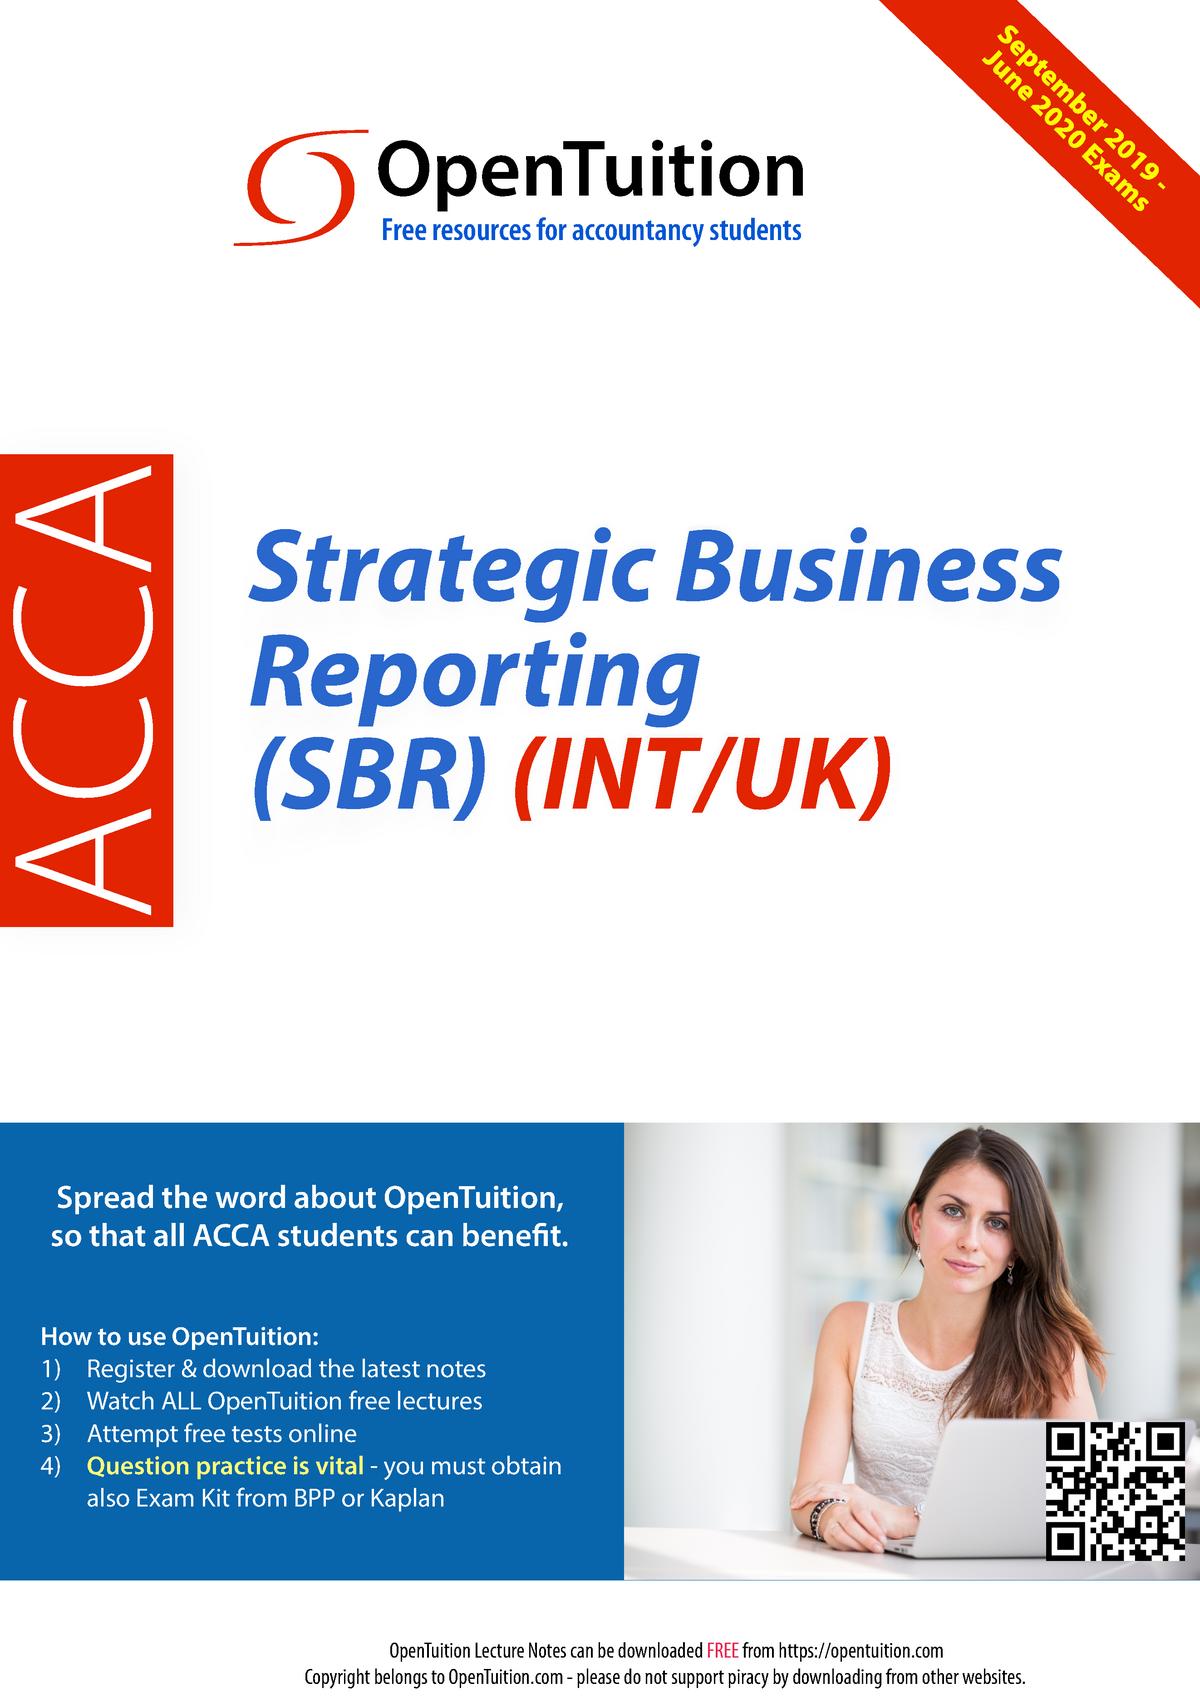 P2 ACCA-SBR-Notes-September-2019-Exams - Financial reporting